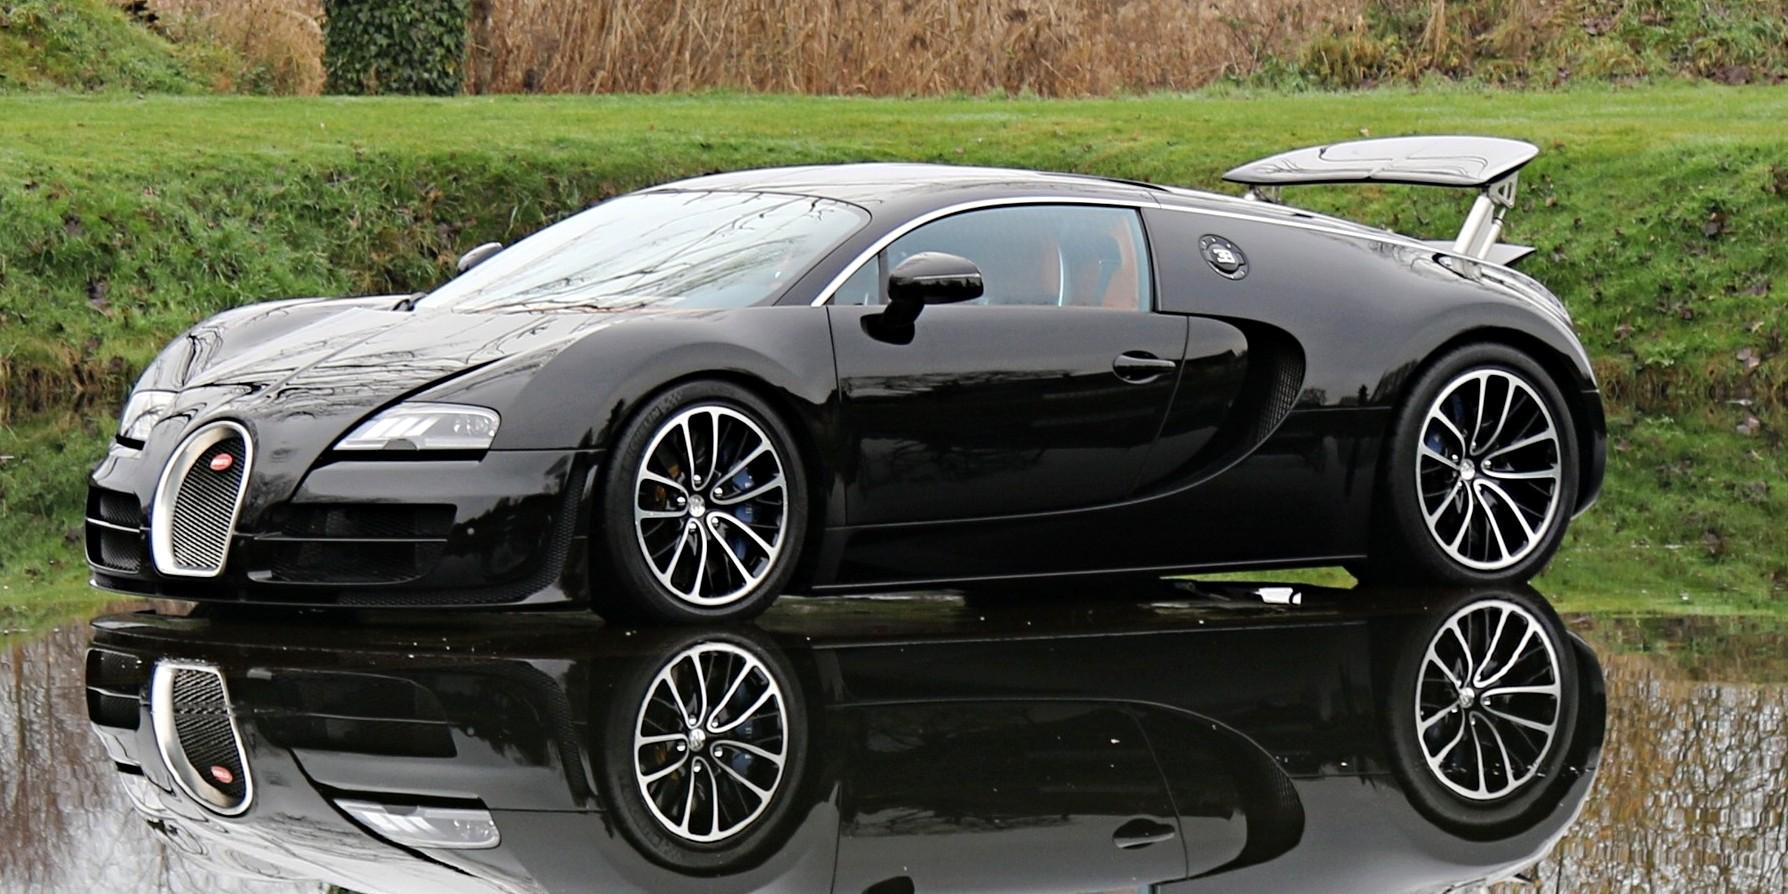 Koenigsegg agera rs vs Bugatti chiron forza horizon, specs